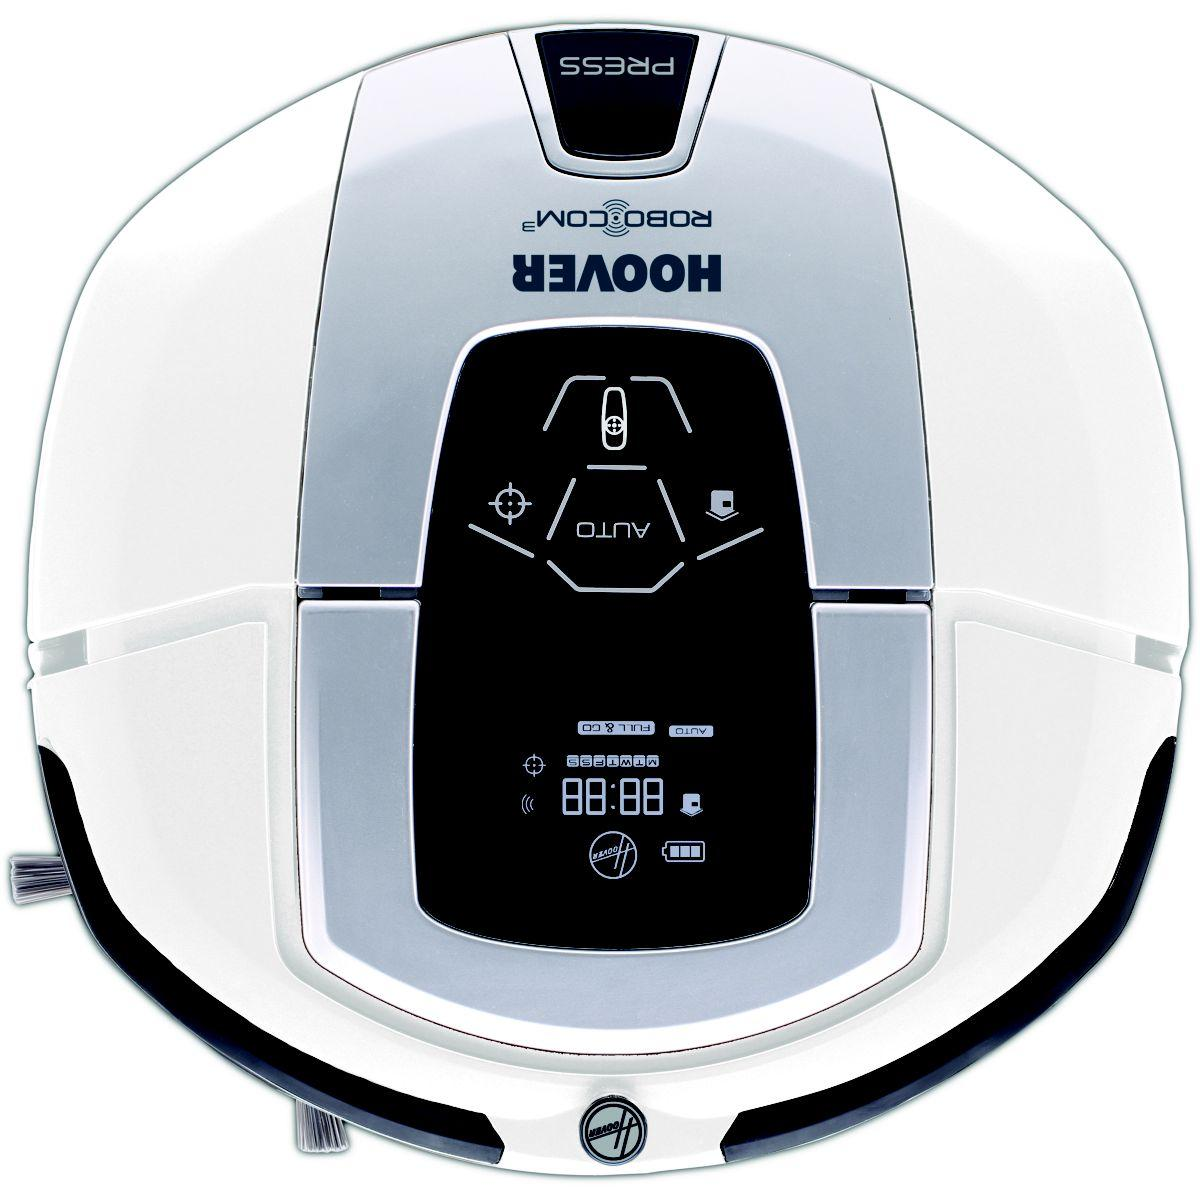 Aspirateur Robot HOOVER RBC031B/1 robocom3 Lit